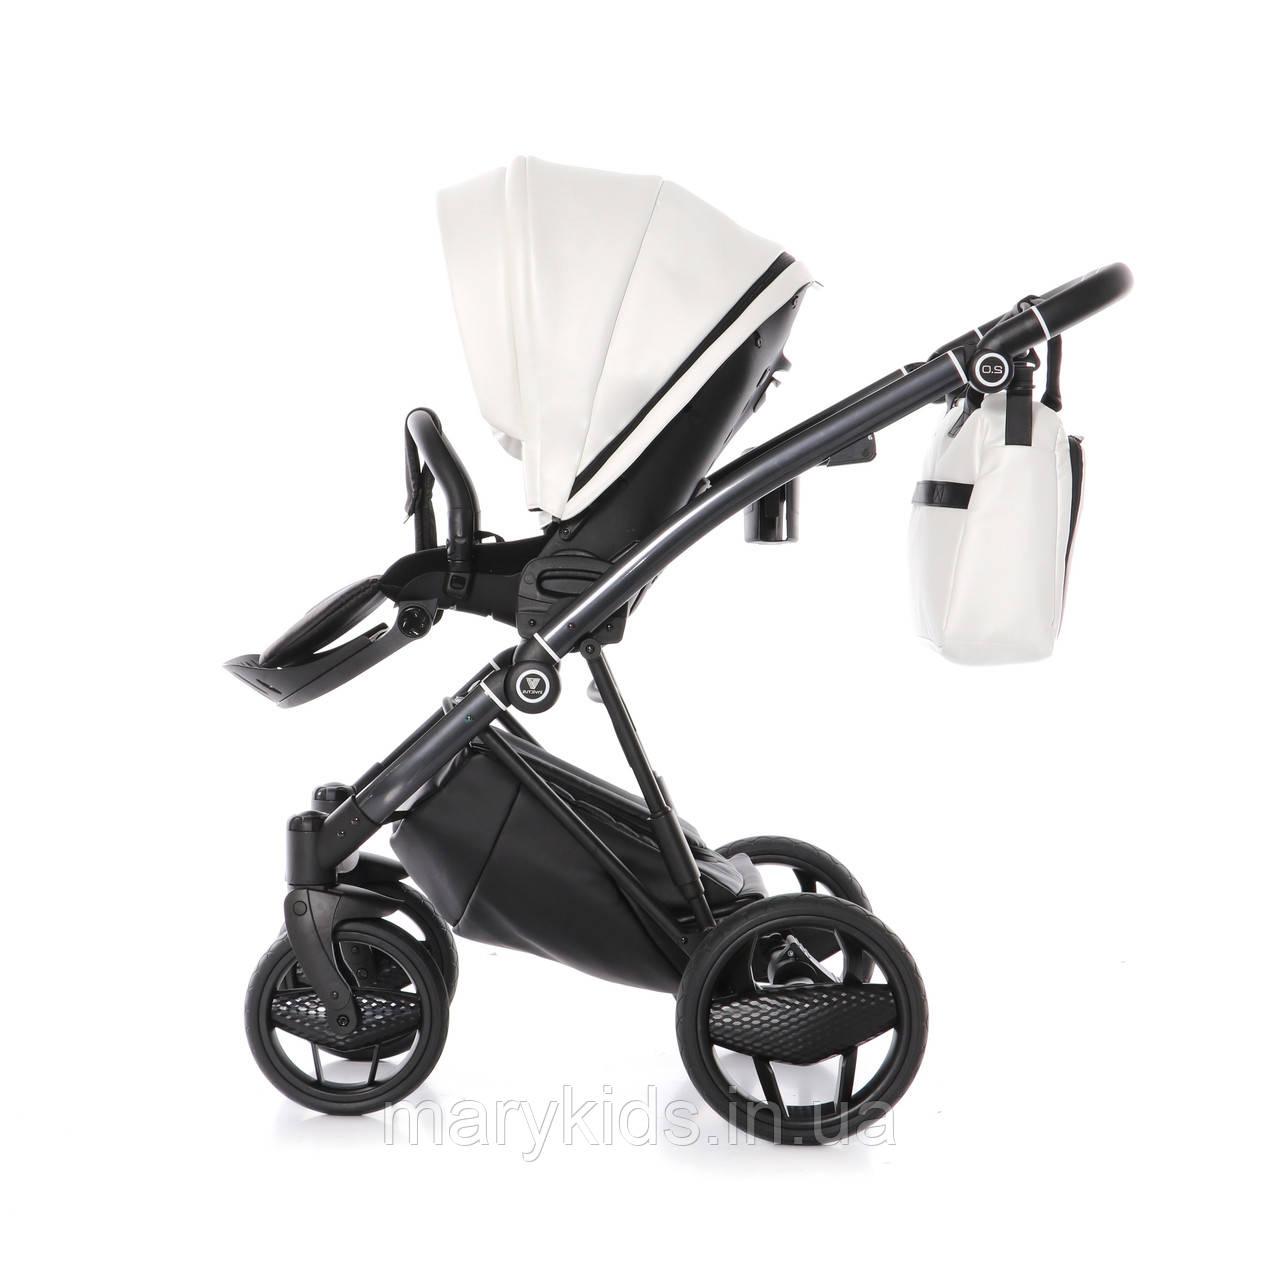 Дитяча універсальна коляска 2 в 1 Invicus 2.0 - 04